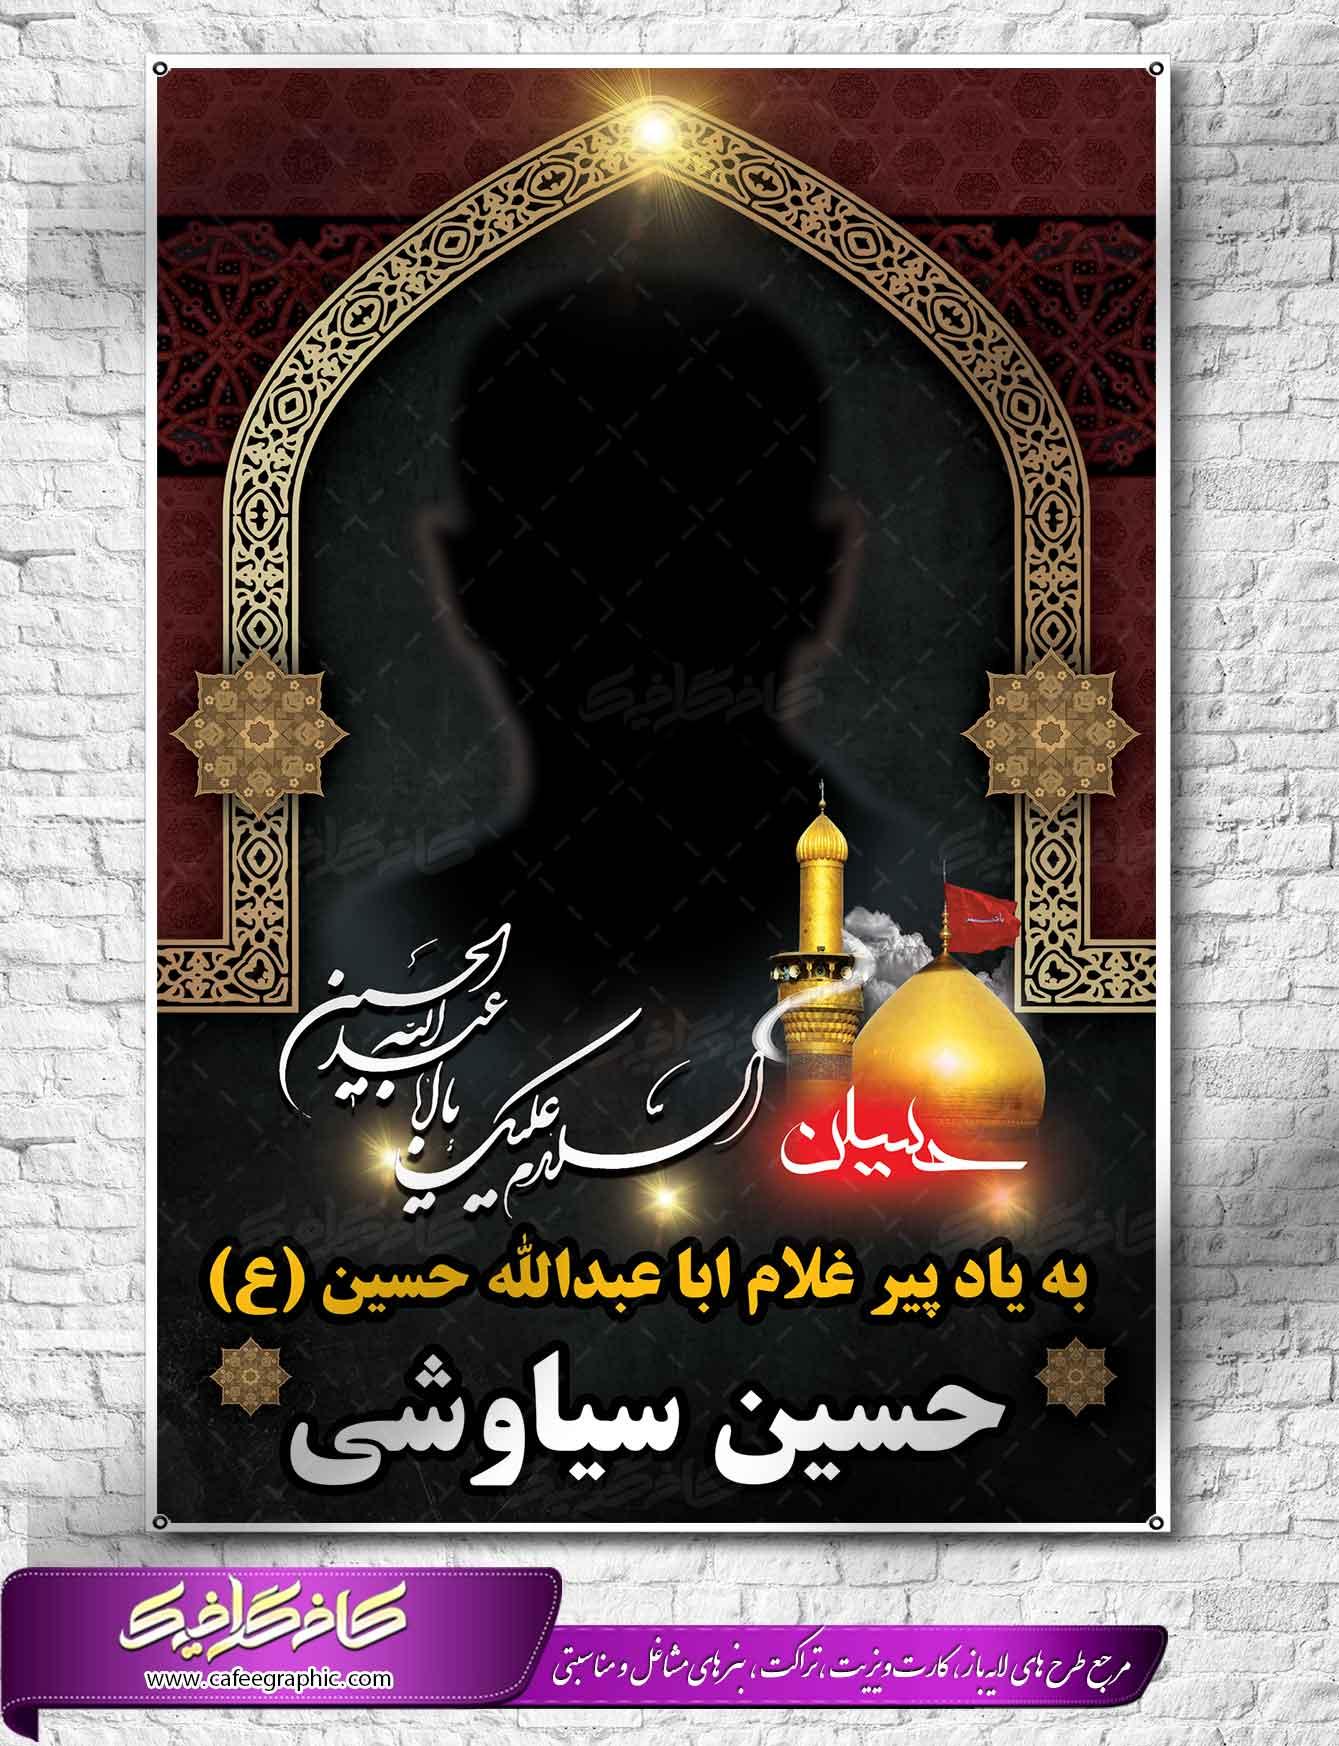 بنر تسلیت پیر غلام حسینی